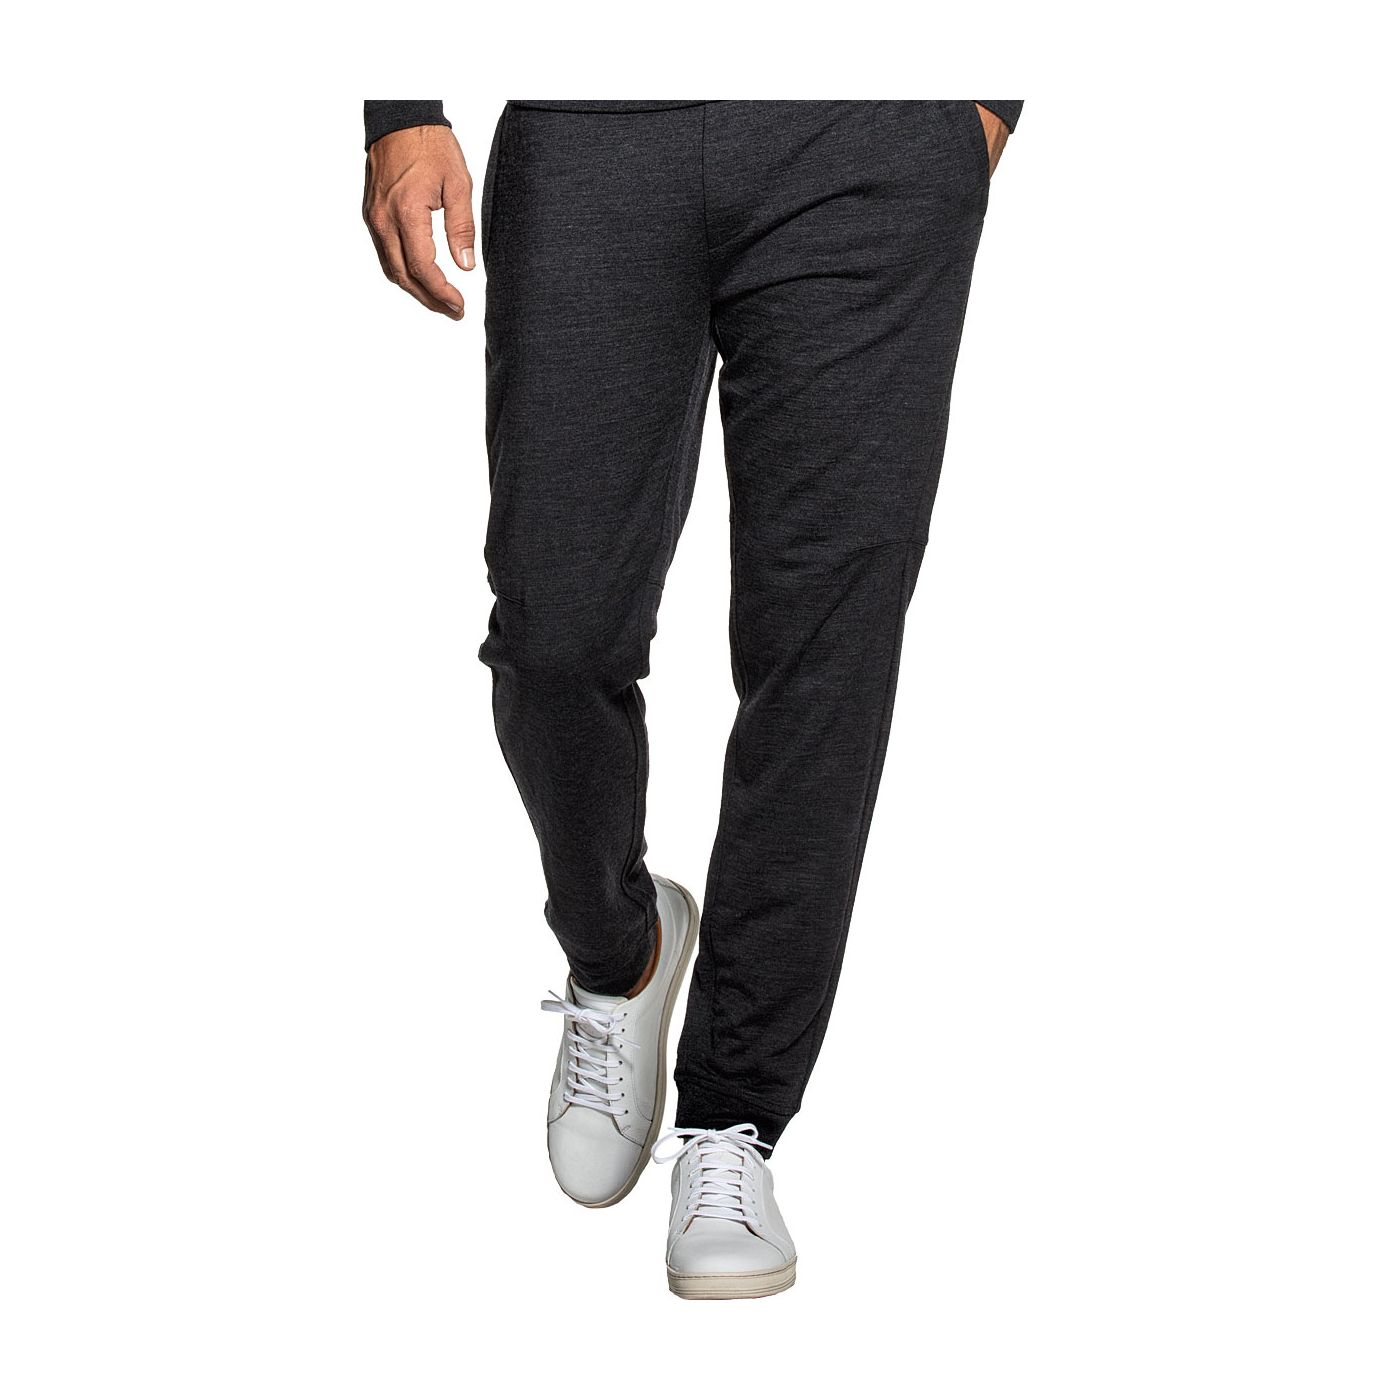 Sweatpants for men made of Merino wool in Dark grey